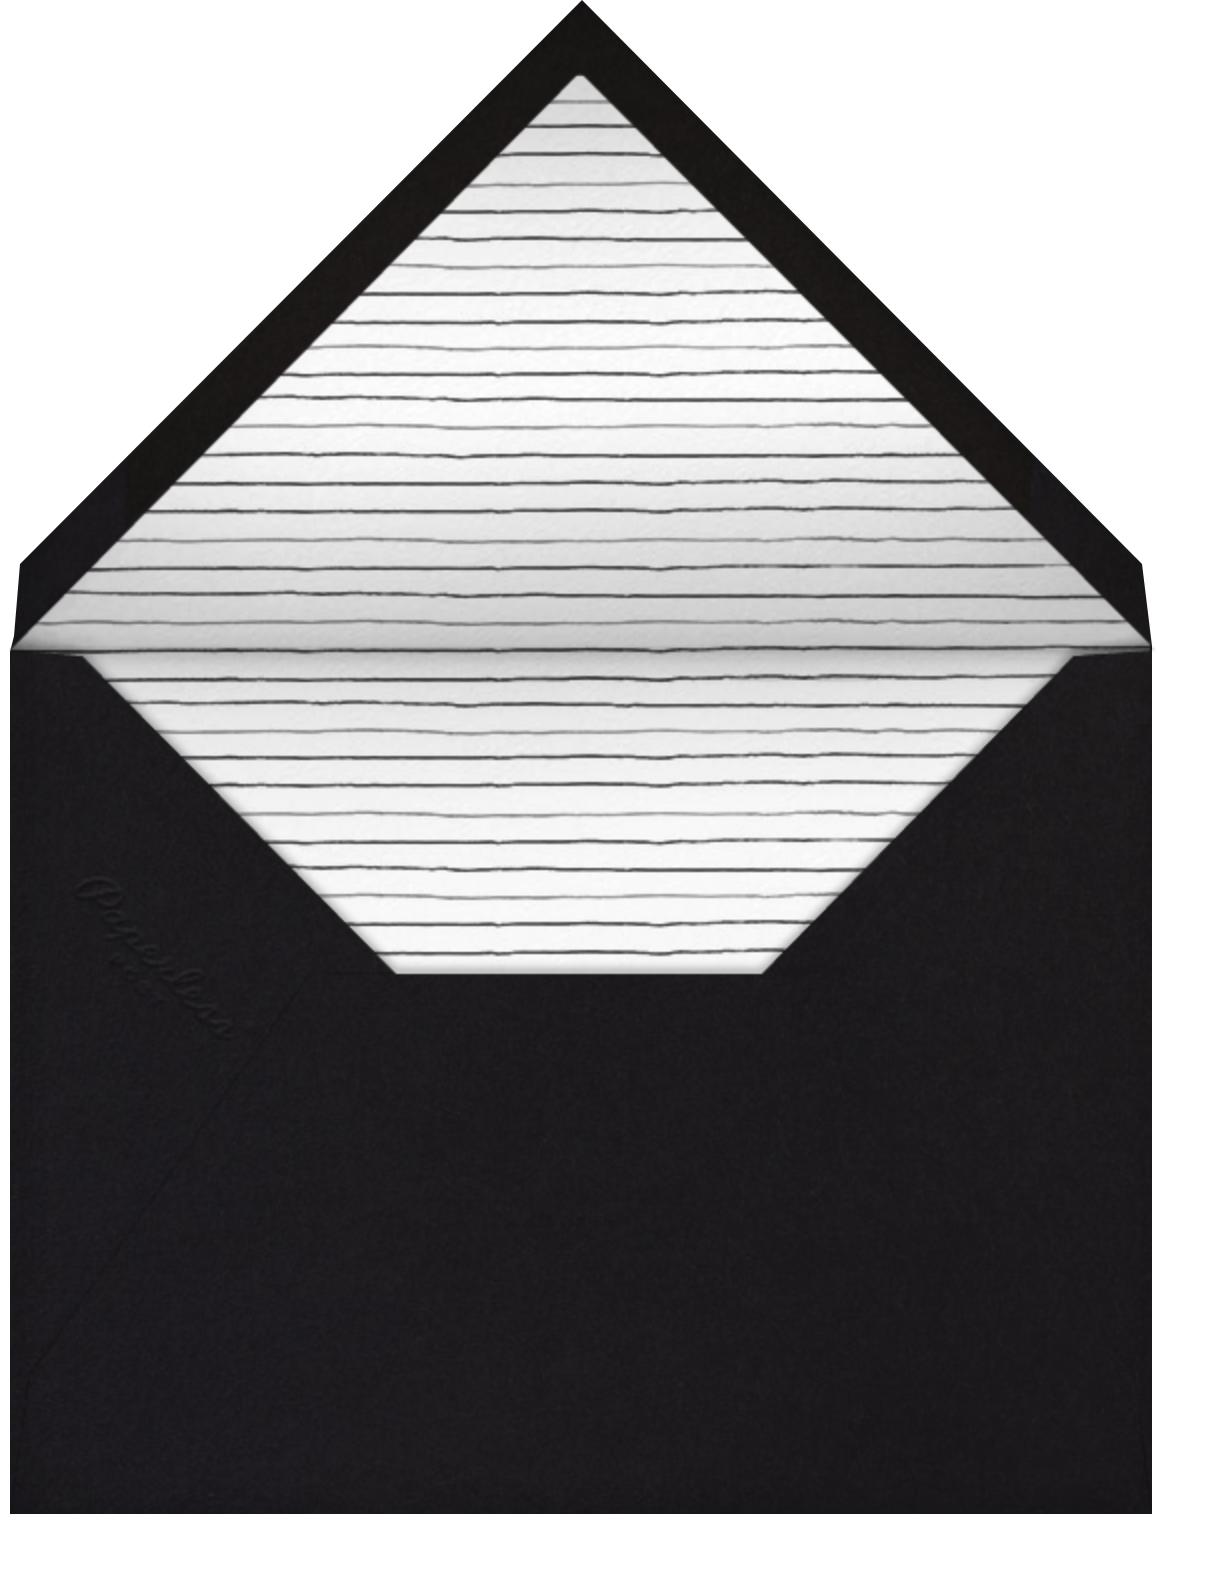 Housewarming Party - Paper Source - Housewarming - envelope back